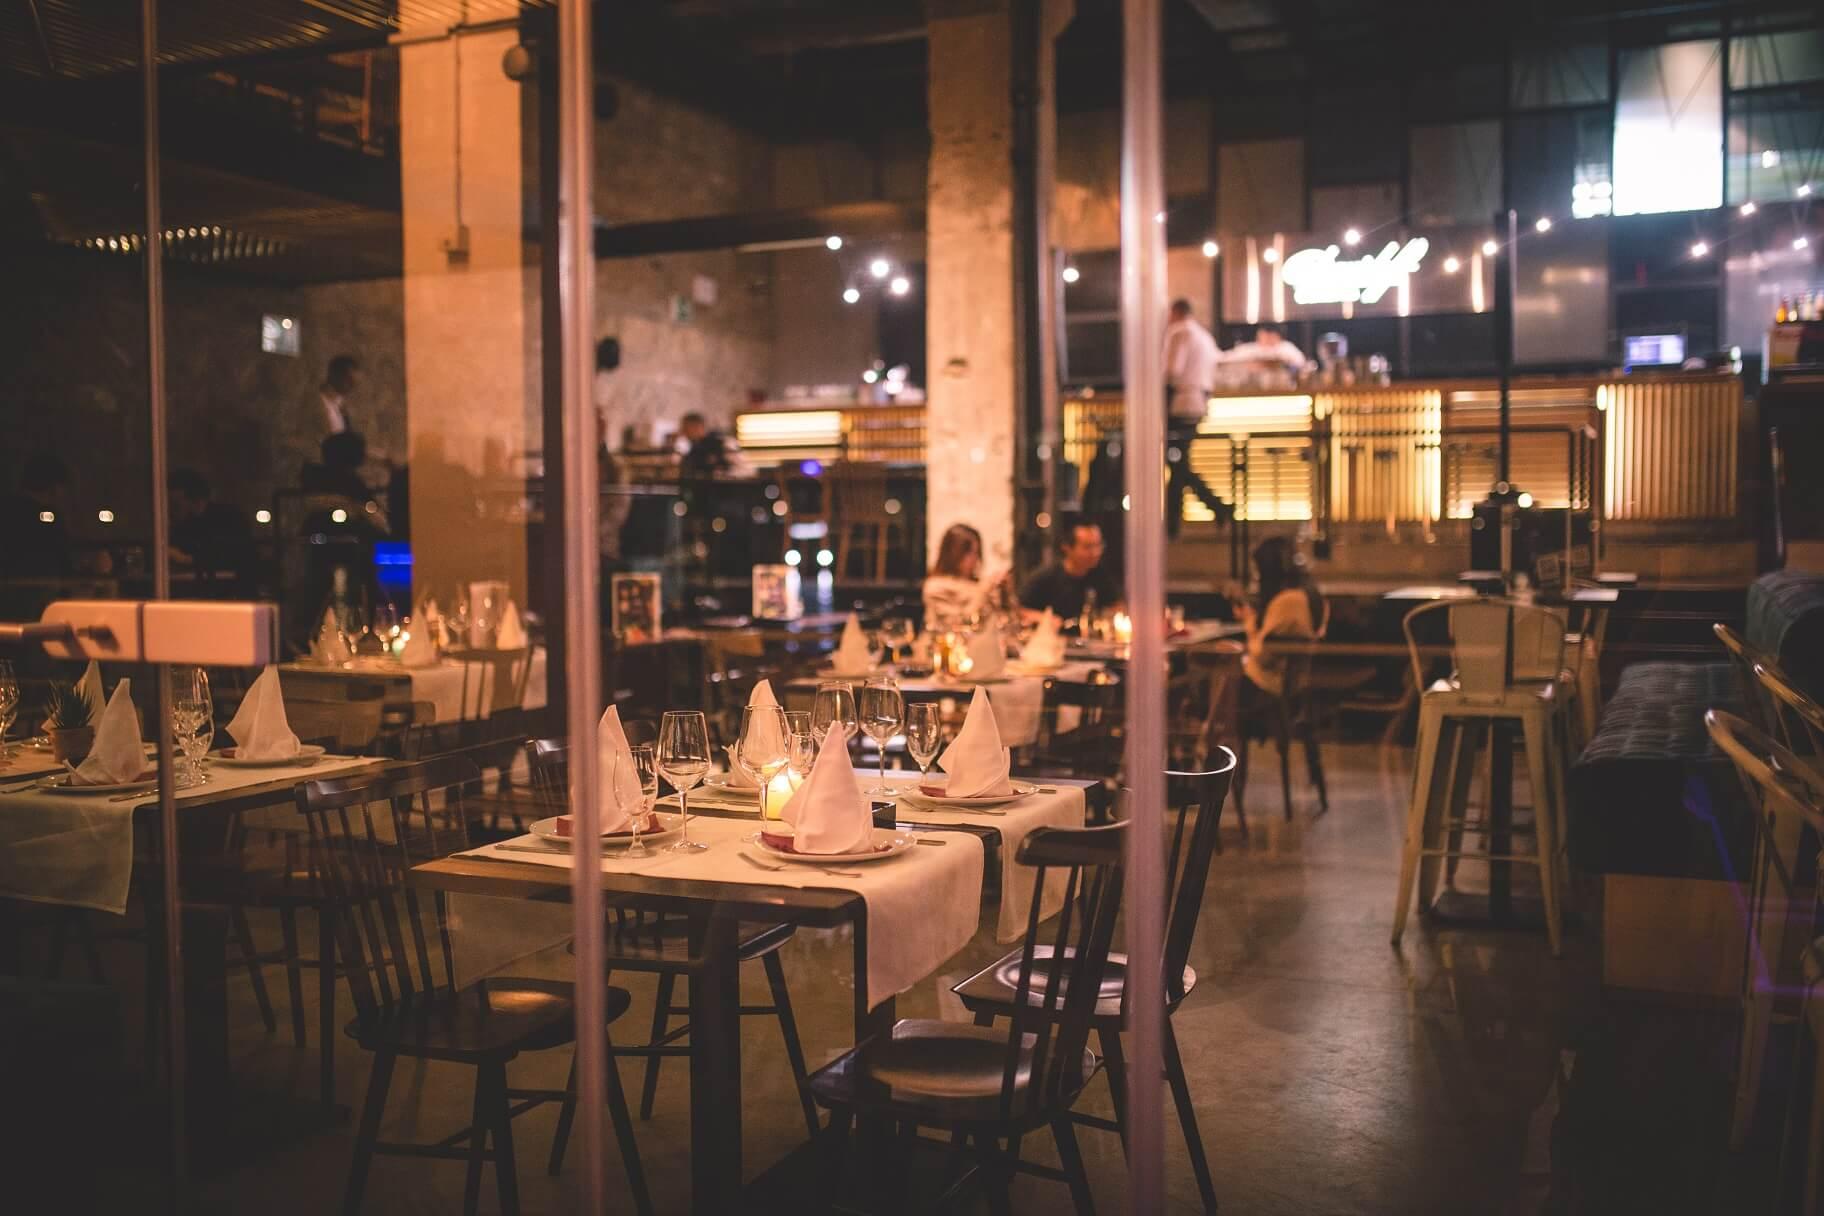 restoran magaza beton hala nova godina 1